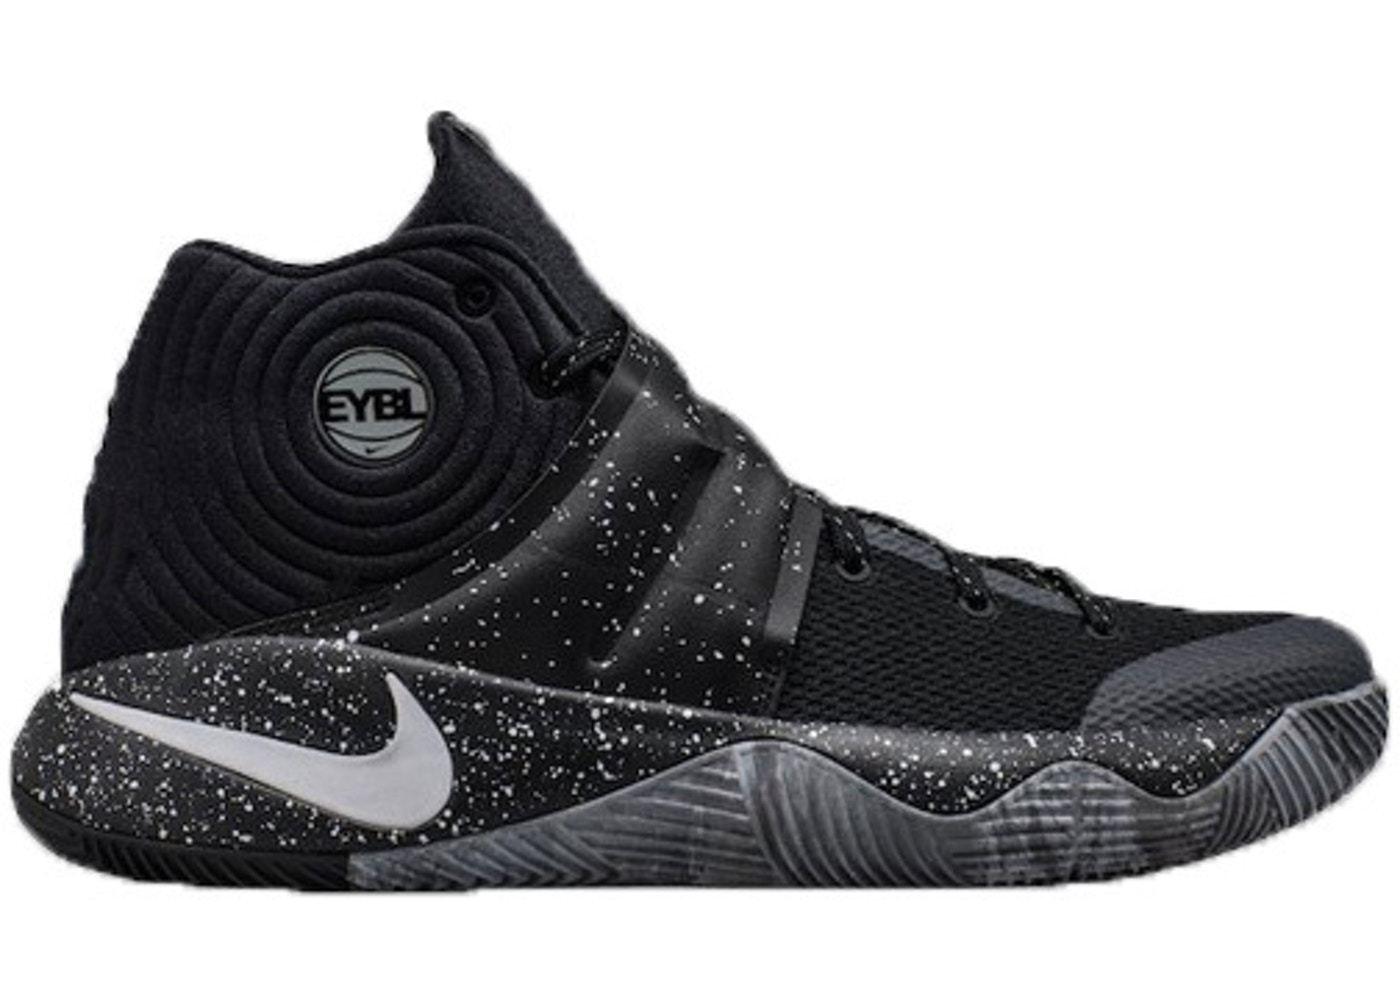 e45364af916 Nike Kyrie EYBL PE Black White Size 12. 647588-270 Jordan Kobe 2  noeqks2084-Athletic Shoes